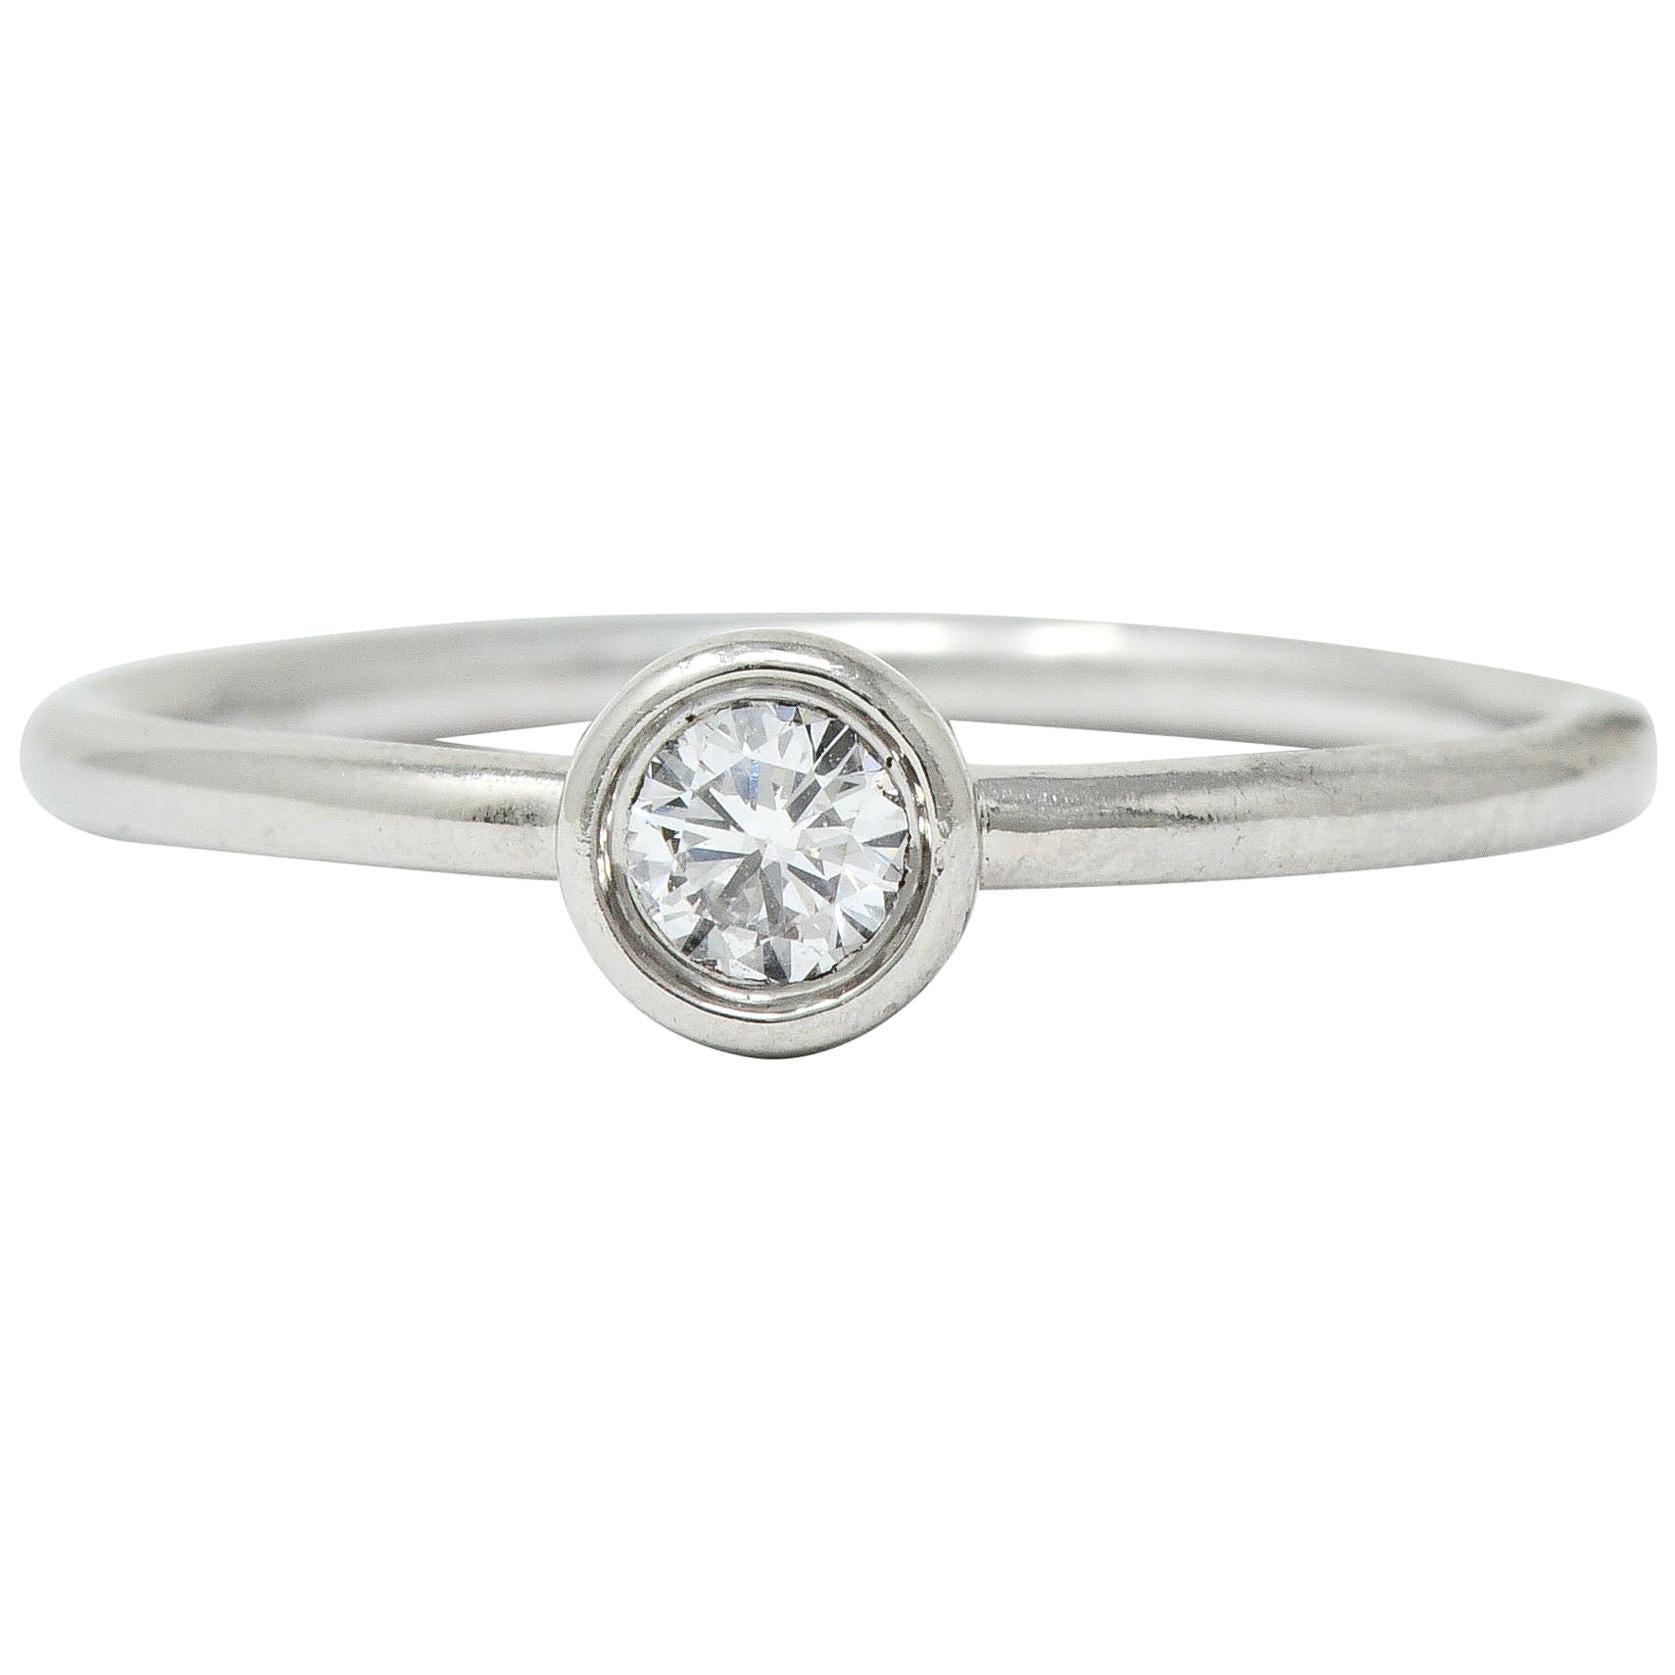 Tiffany & Co. Contemporary Diamond Platinum Bezet Solitaire Ring